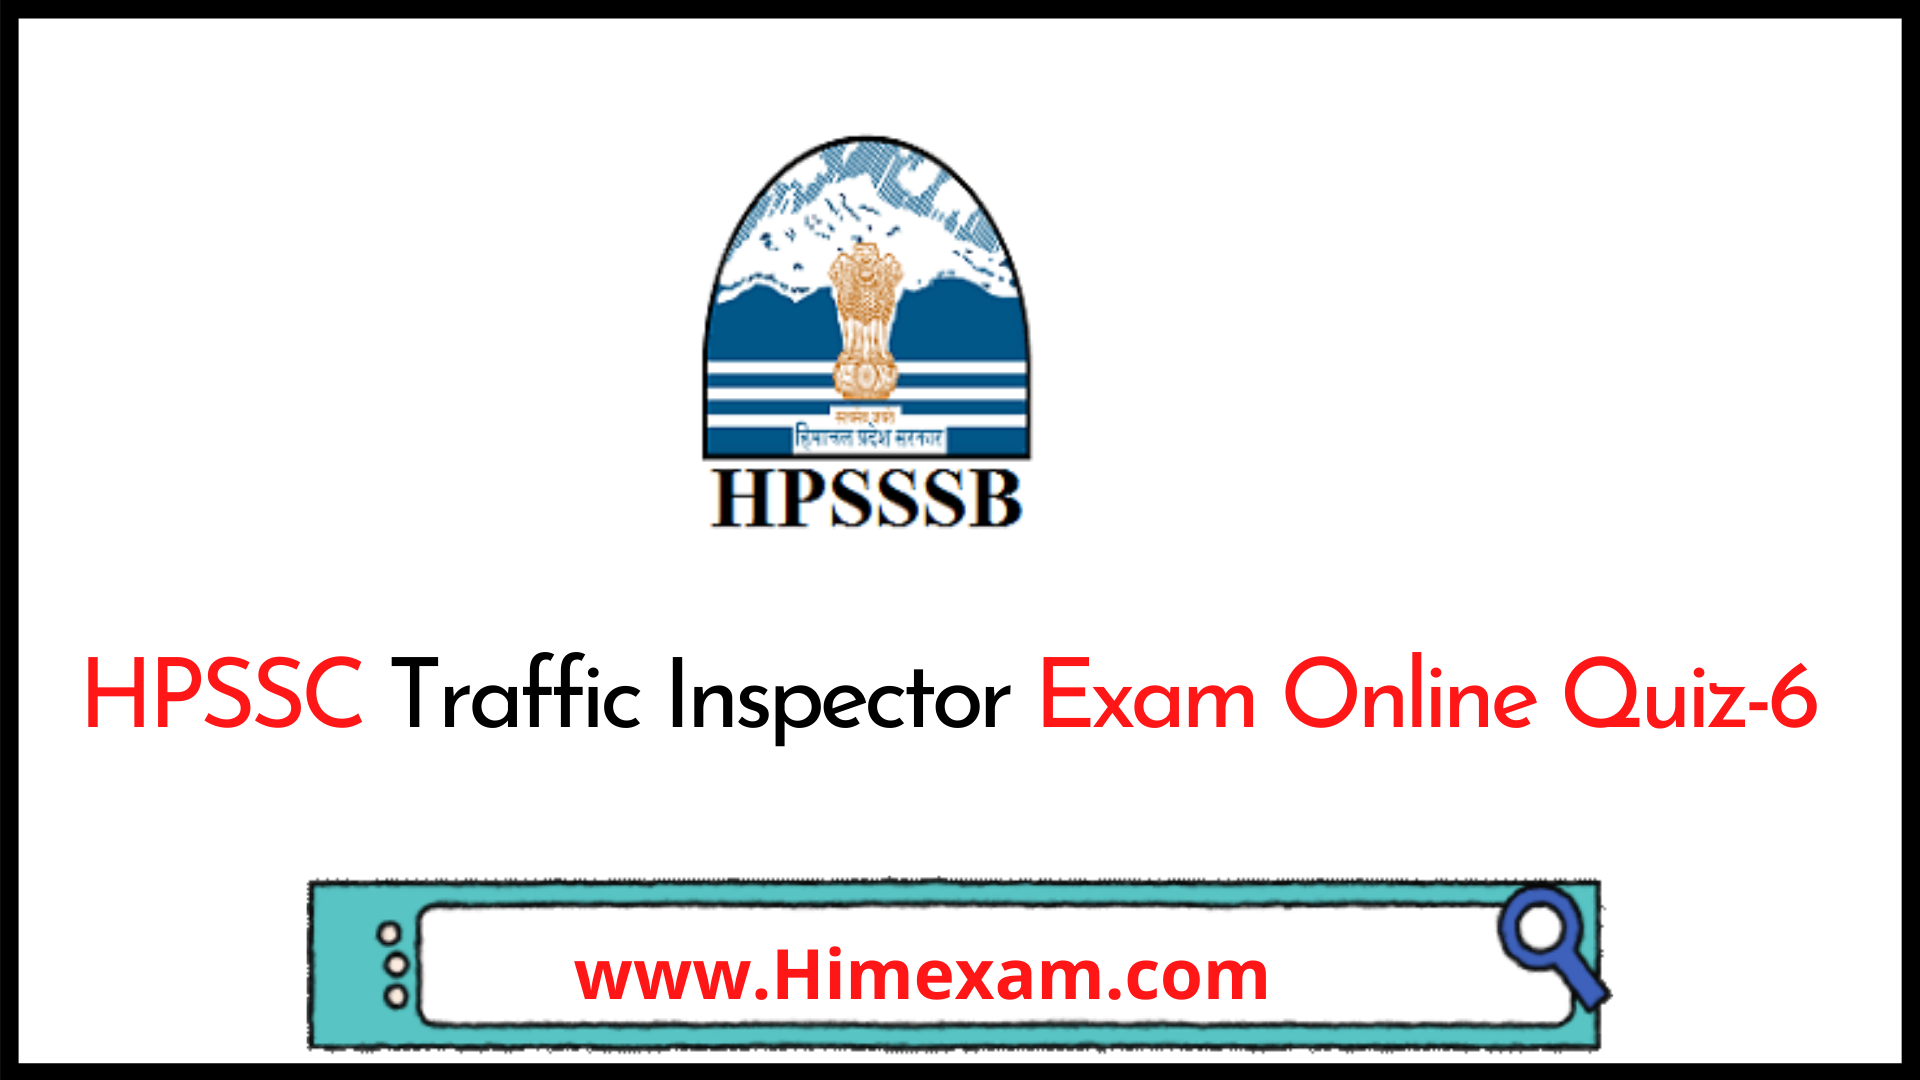 HPSSC Traffic Inspector Exam Online Quiz-6